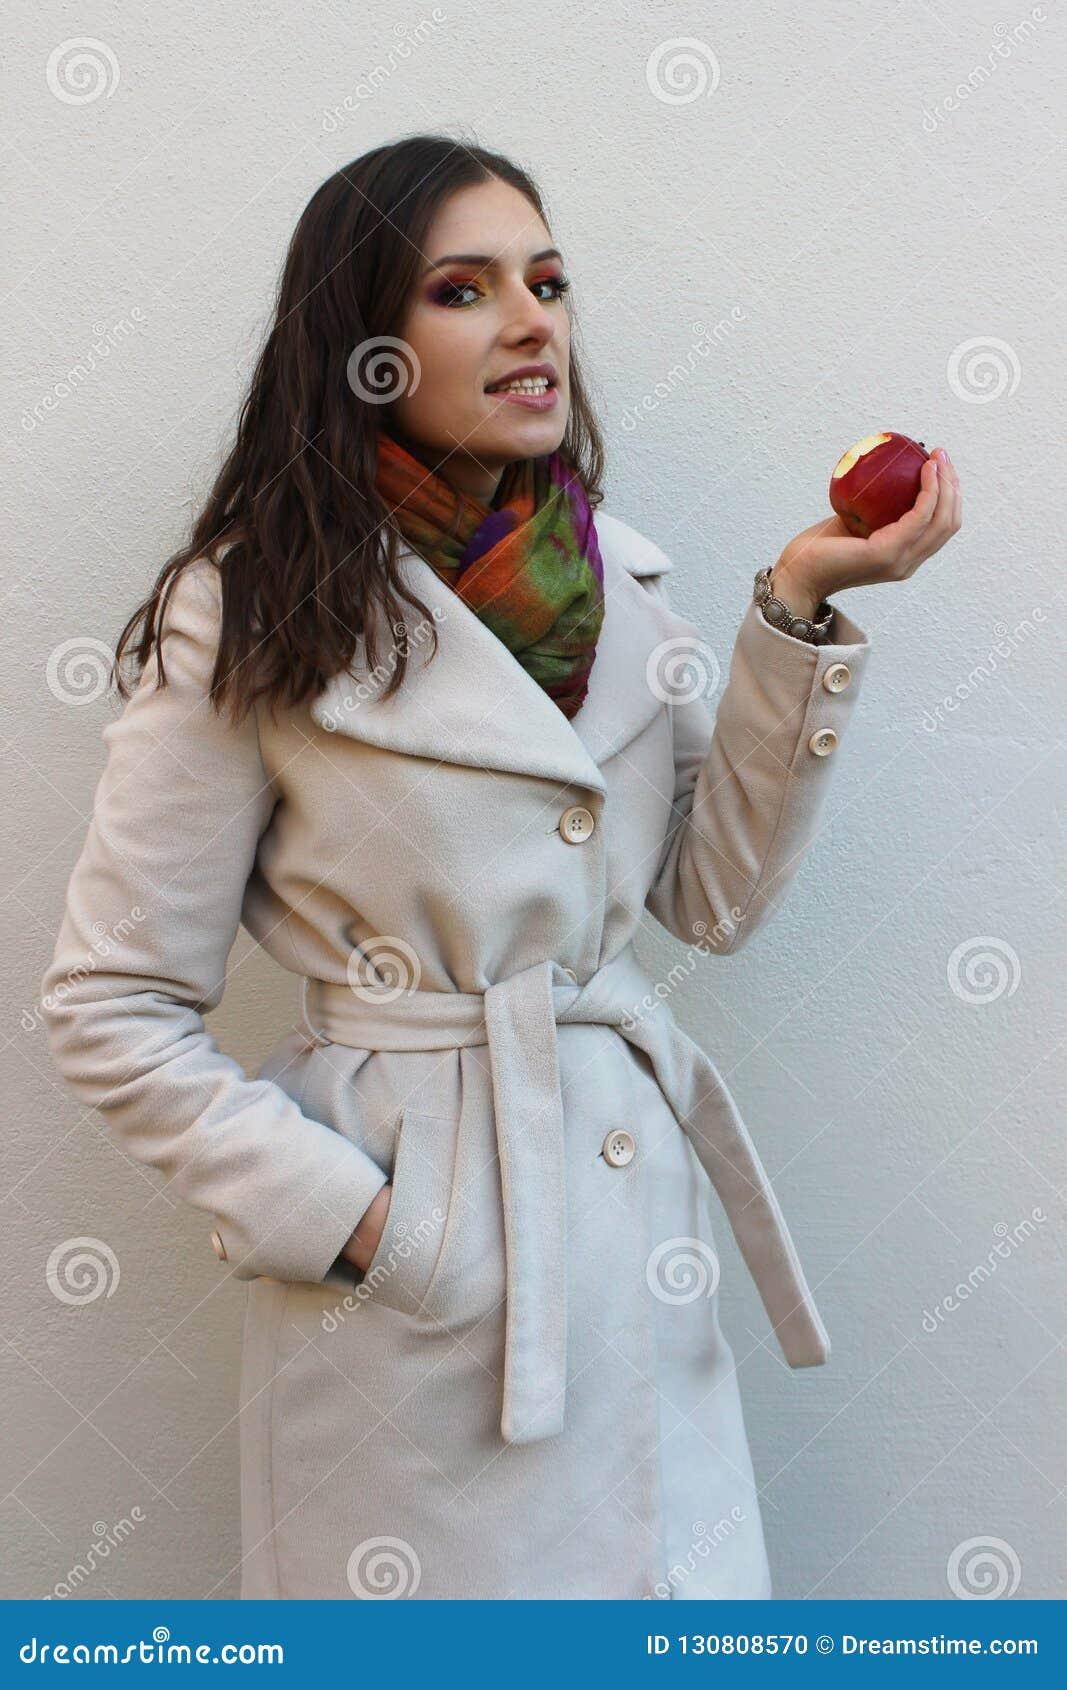 Woman in a coat holding a bitten red juicy apple